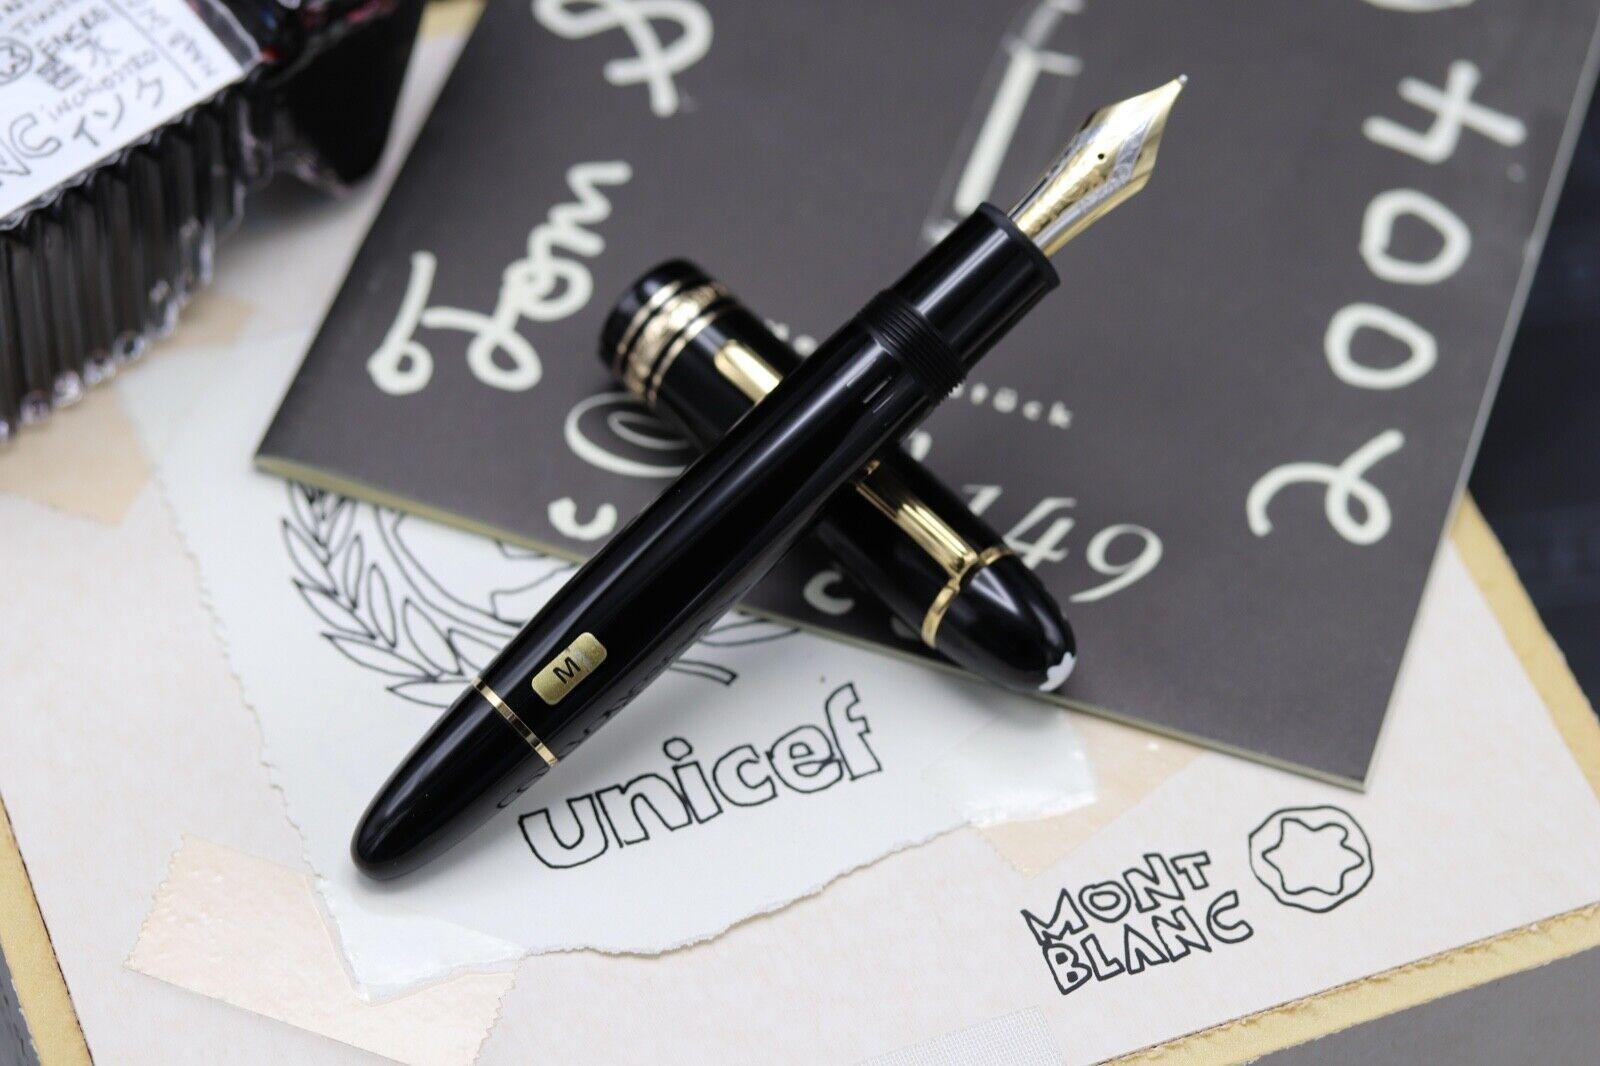 Montblanc Meisterstuck 149 Tom Sachs UNICEF Fountain Pen Set - UNUSED 1